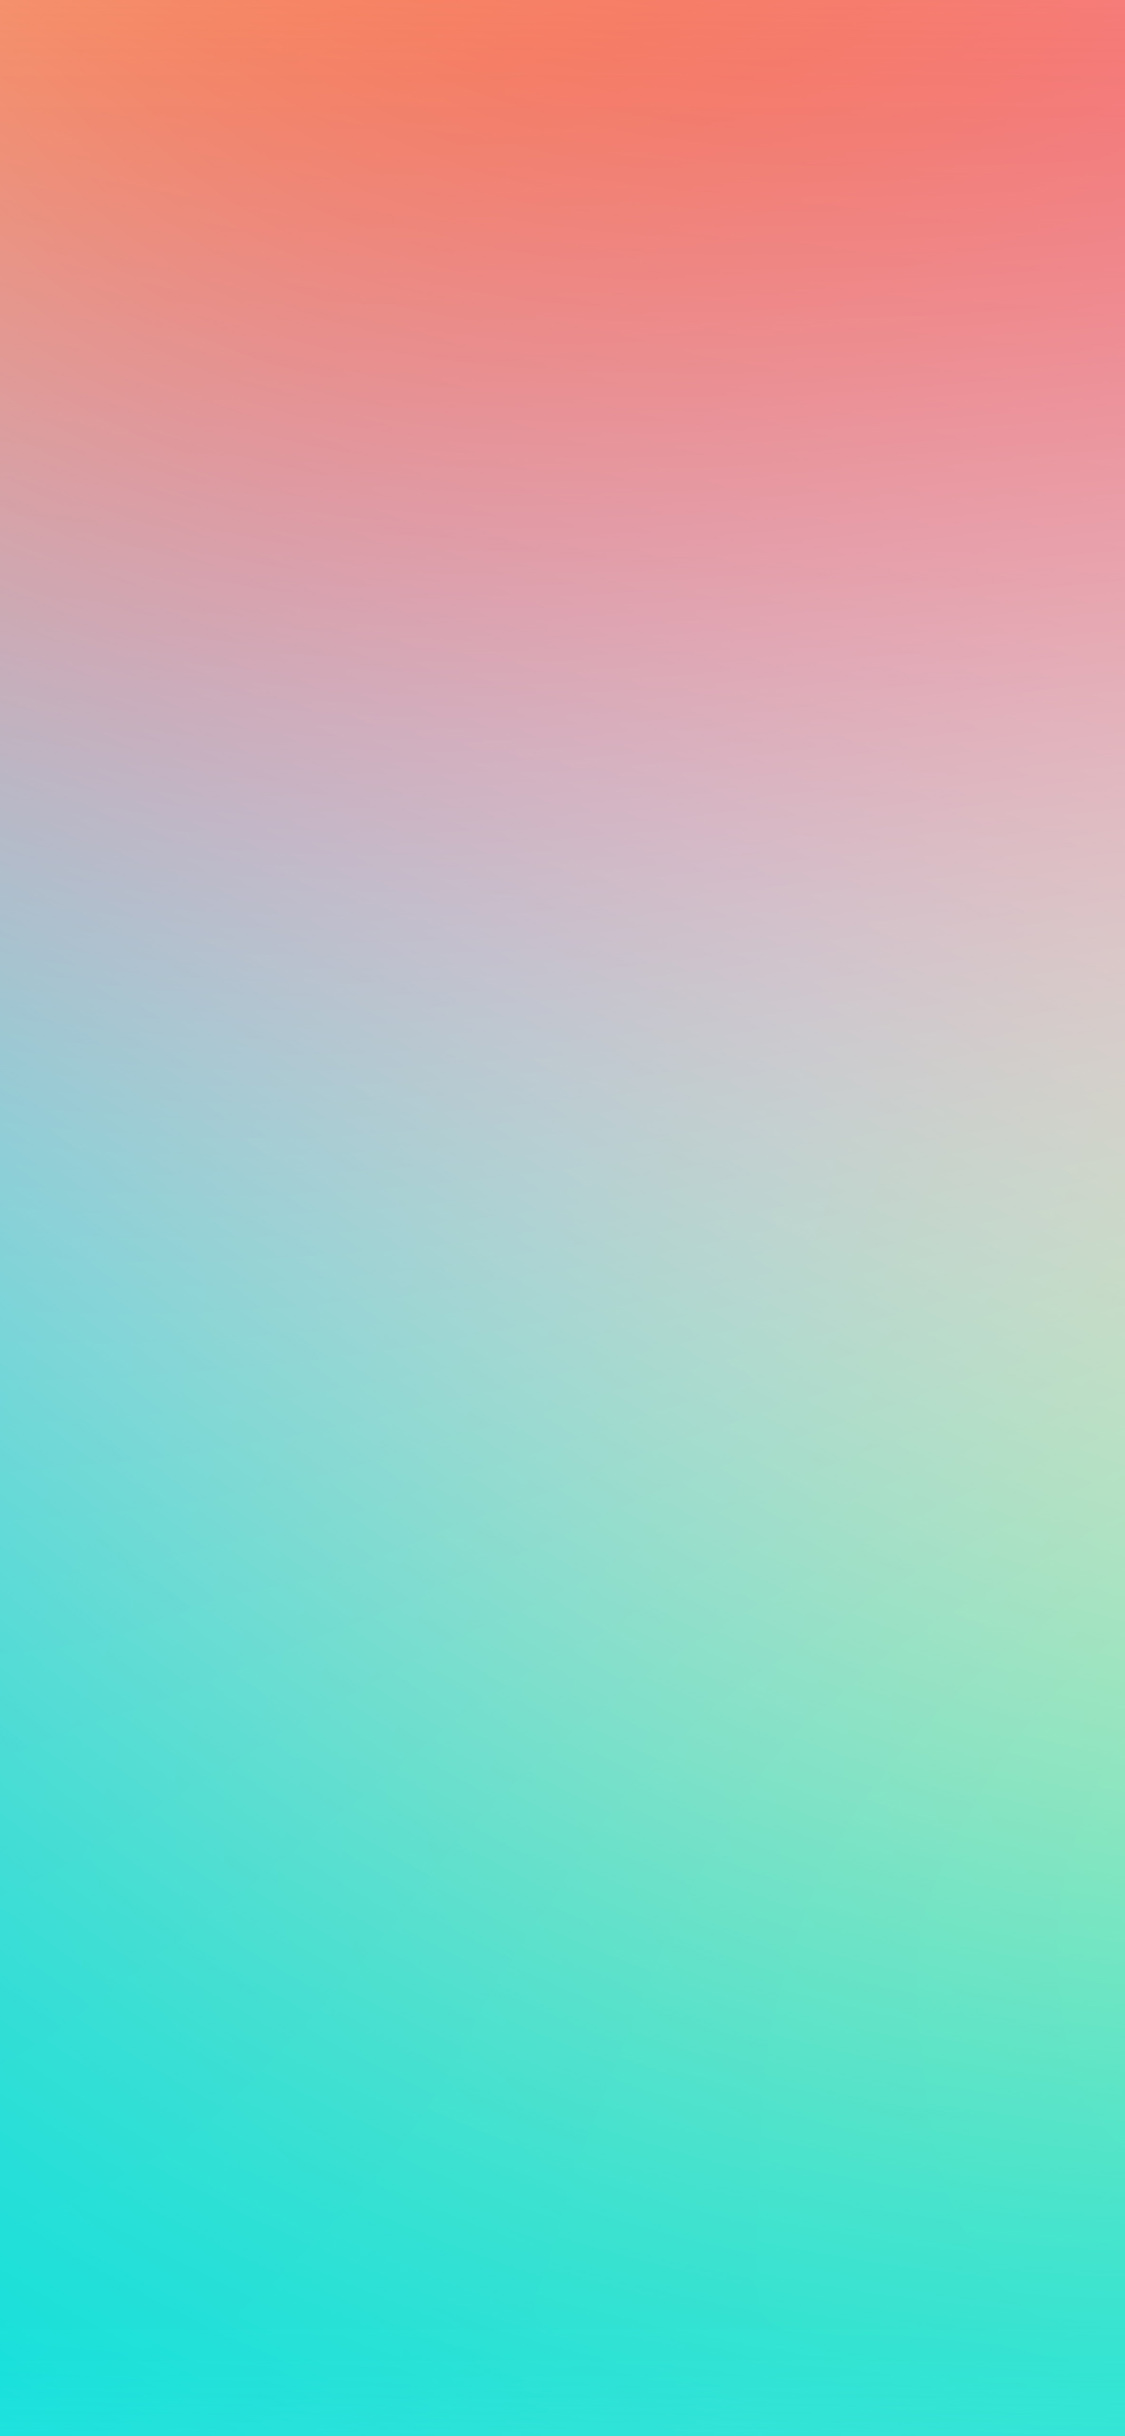 iPhoneXpapers.com-Apple-iPhone-wallpaper-sl64-pink-green-morning-blur-gradation